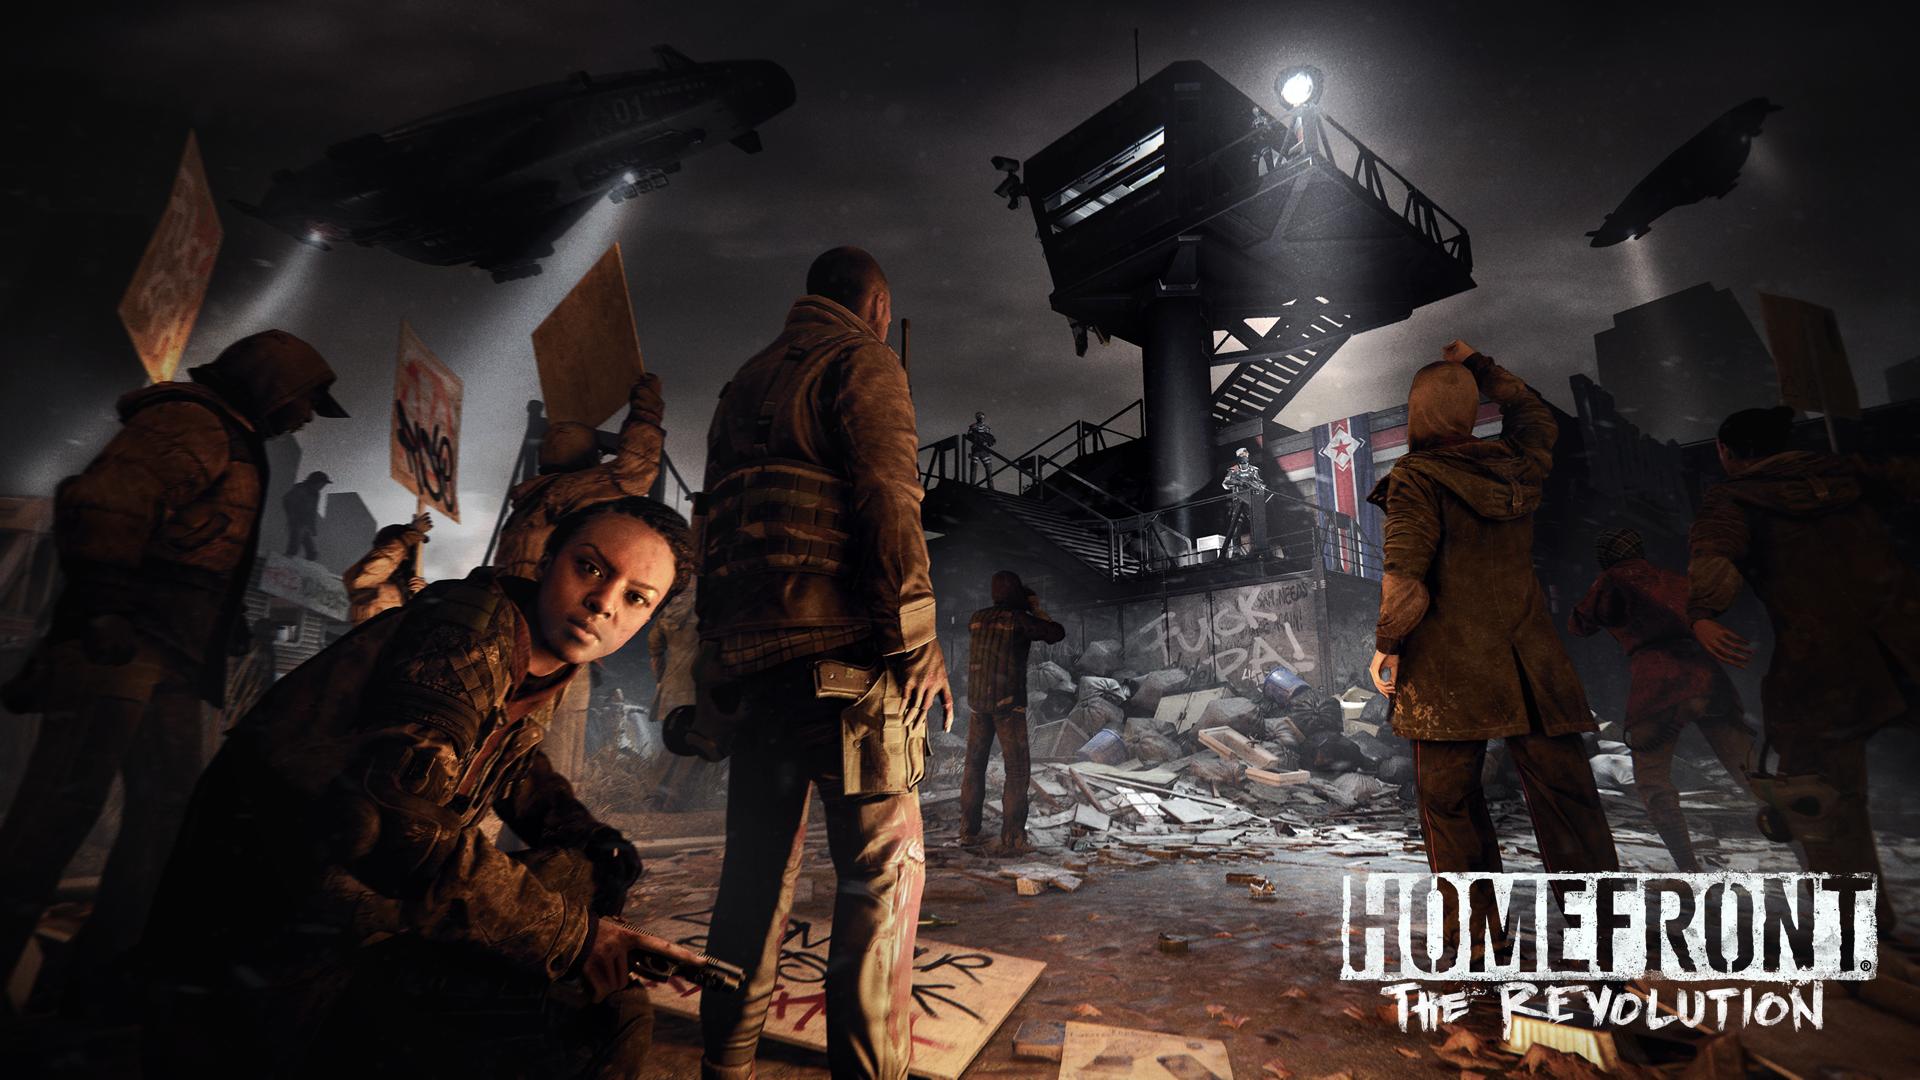 homefront+the+revolution